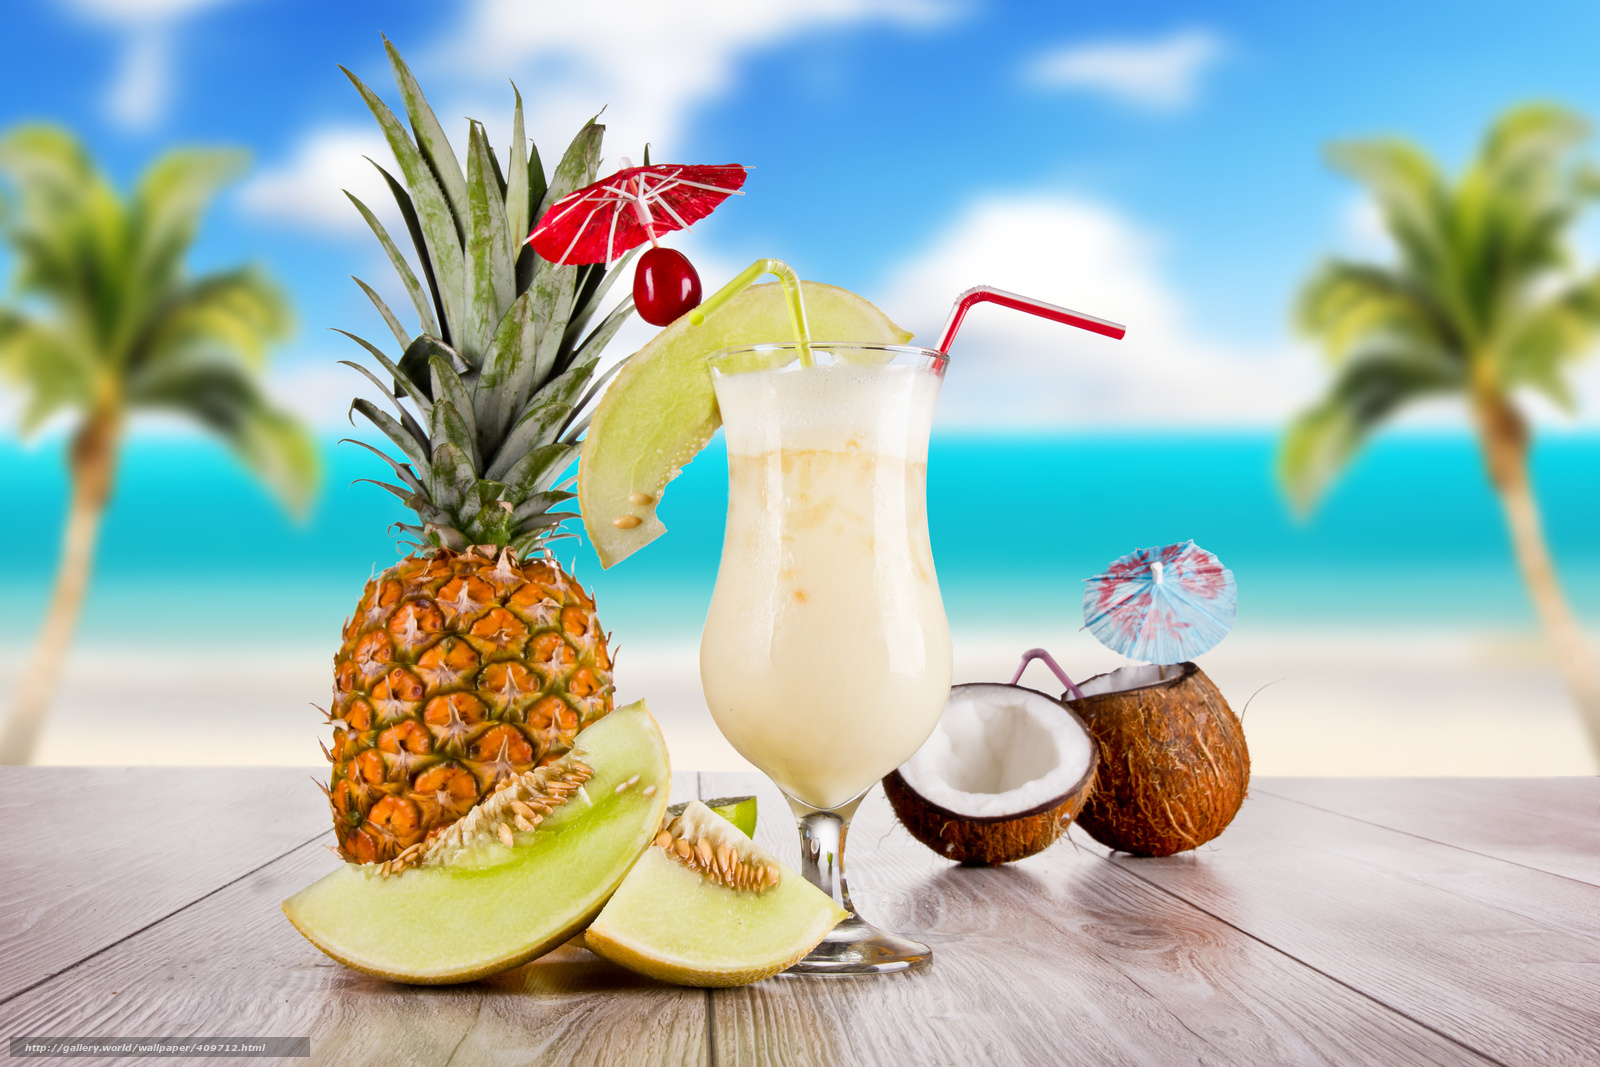 Tlcharger fond d 39 ecran cocktail verre vin noix de coco for Fond ecran ananas